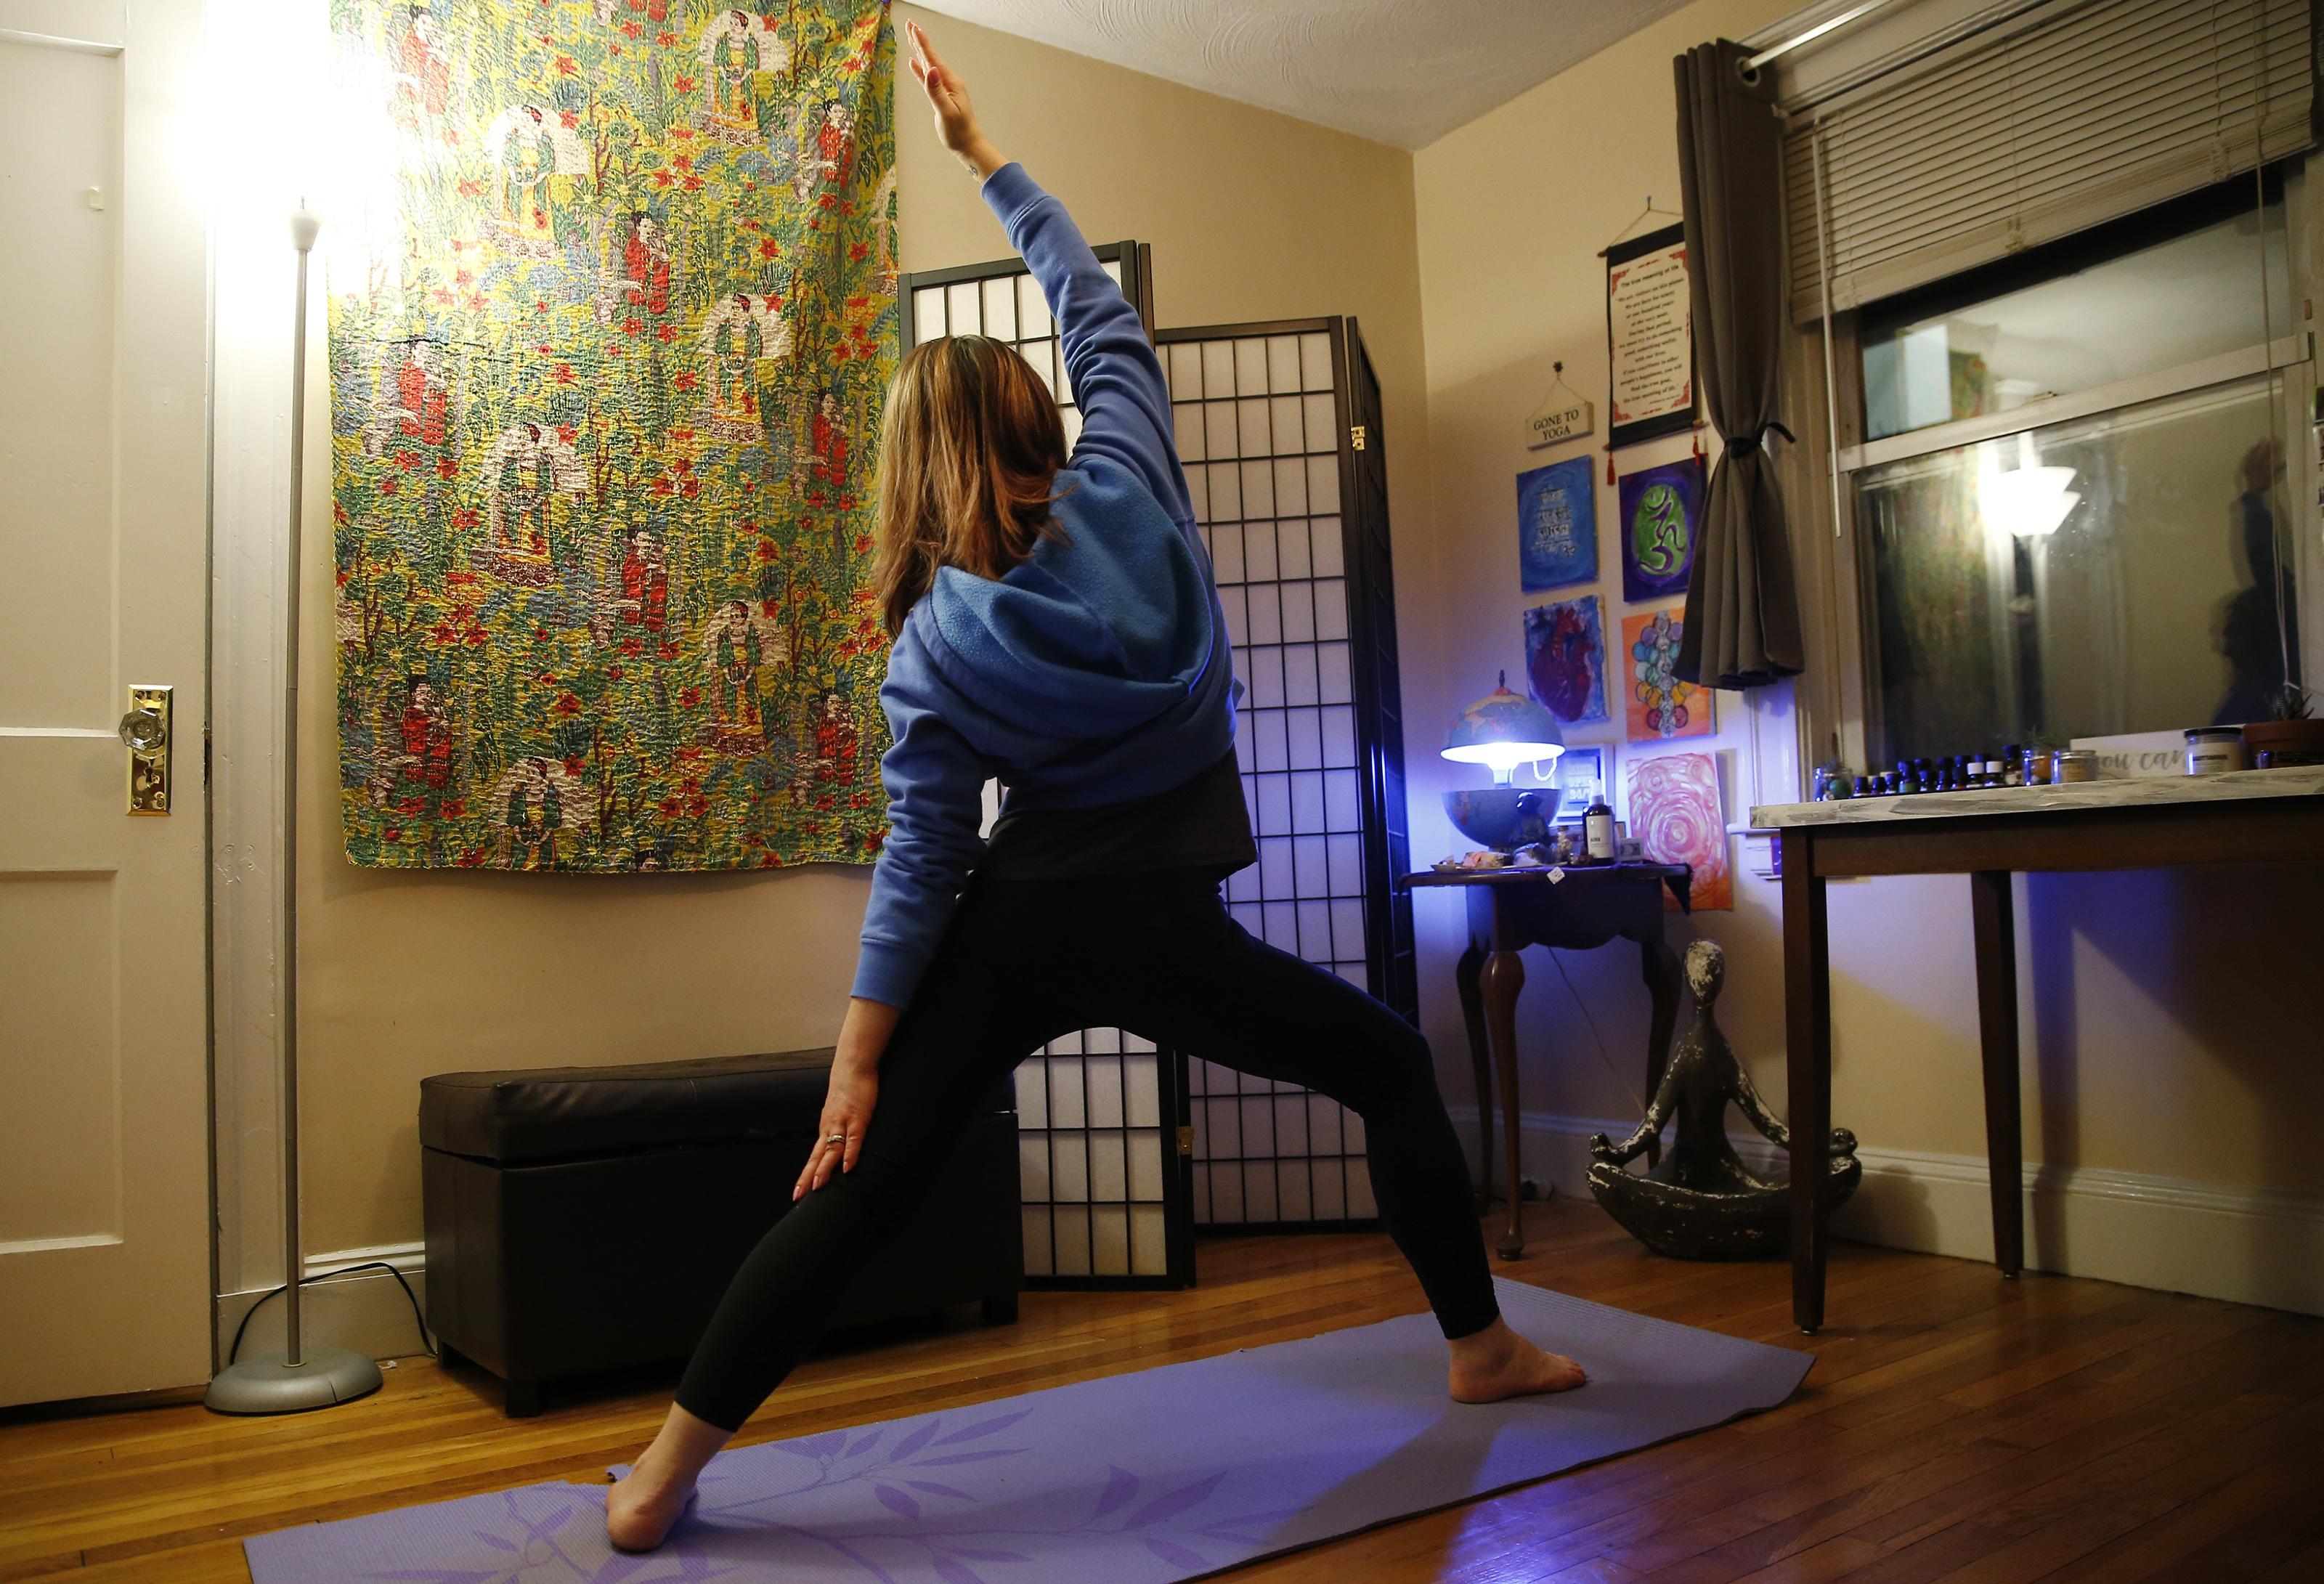 Five Free Workouts You Can Do At Home During The Coronavirus Shutdown The Boston Globe